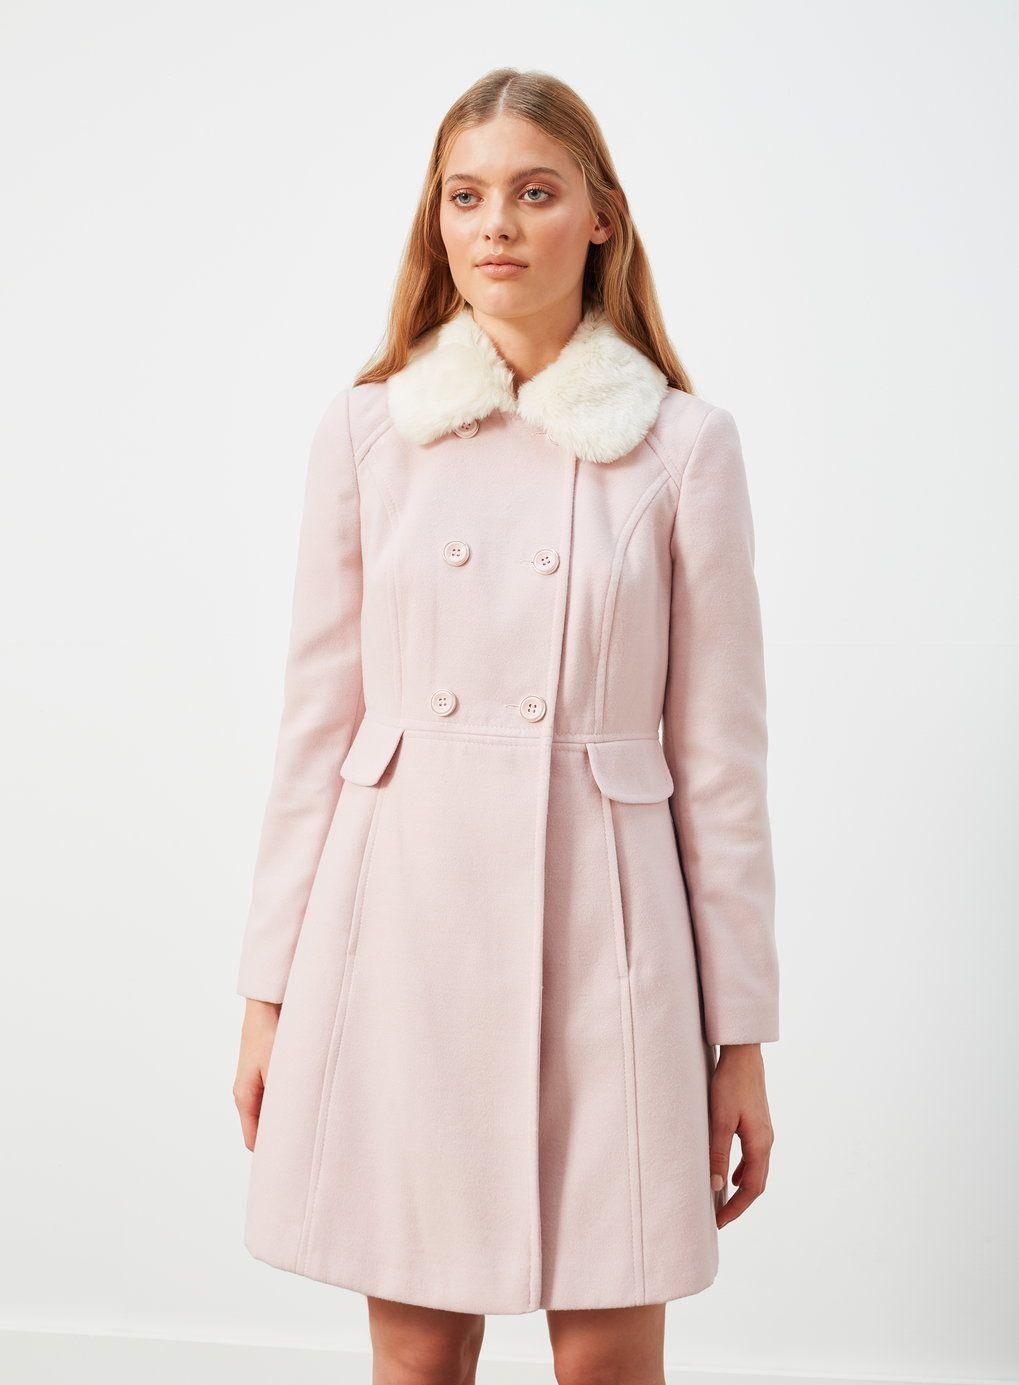 9239574e856b6 Faux Fur Collar Button Coat - Miss Selfridge